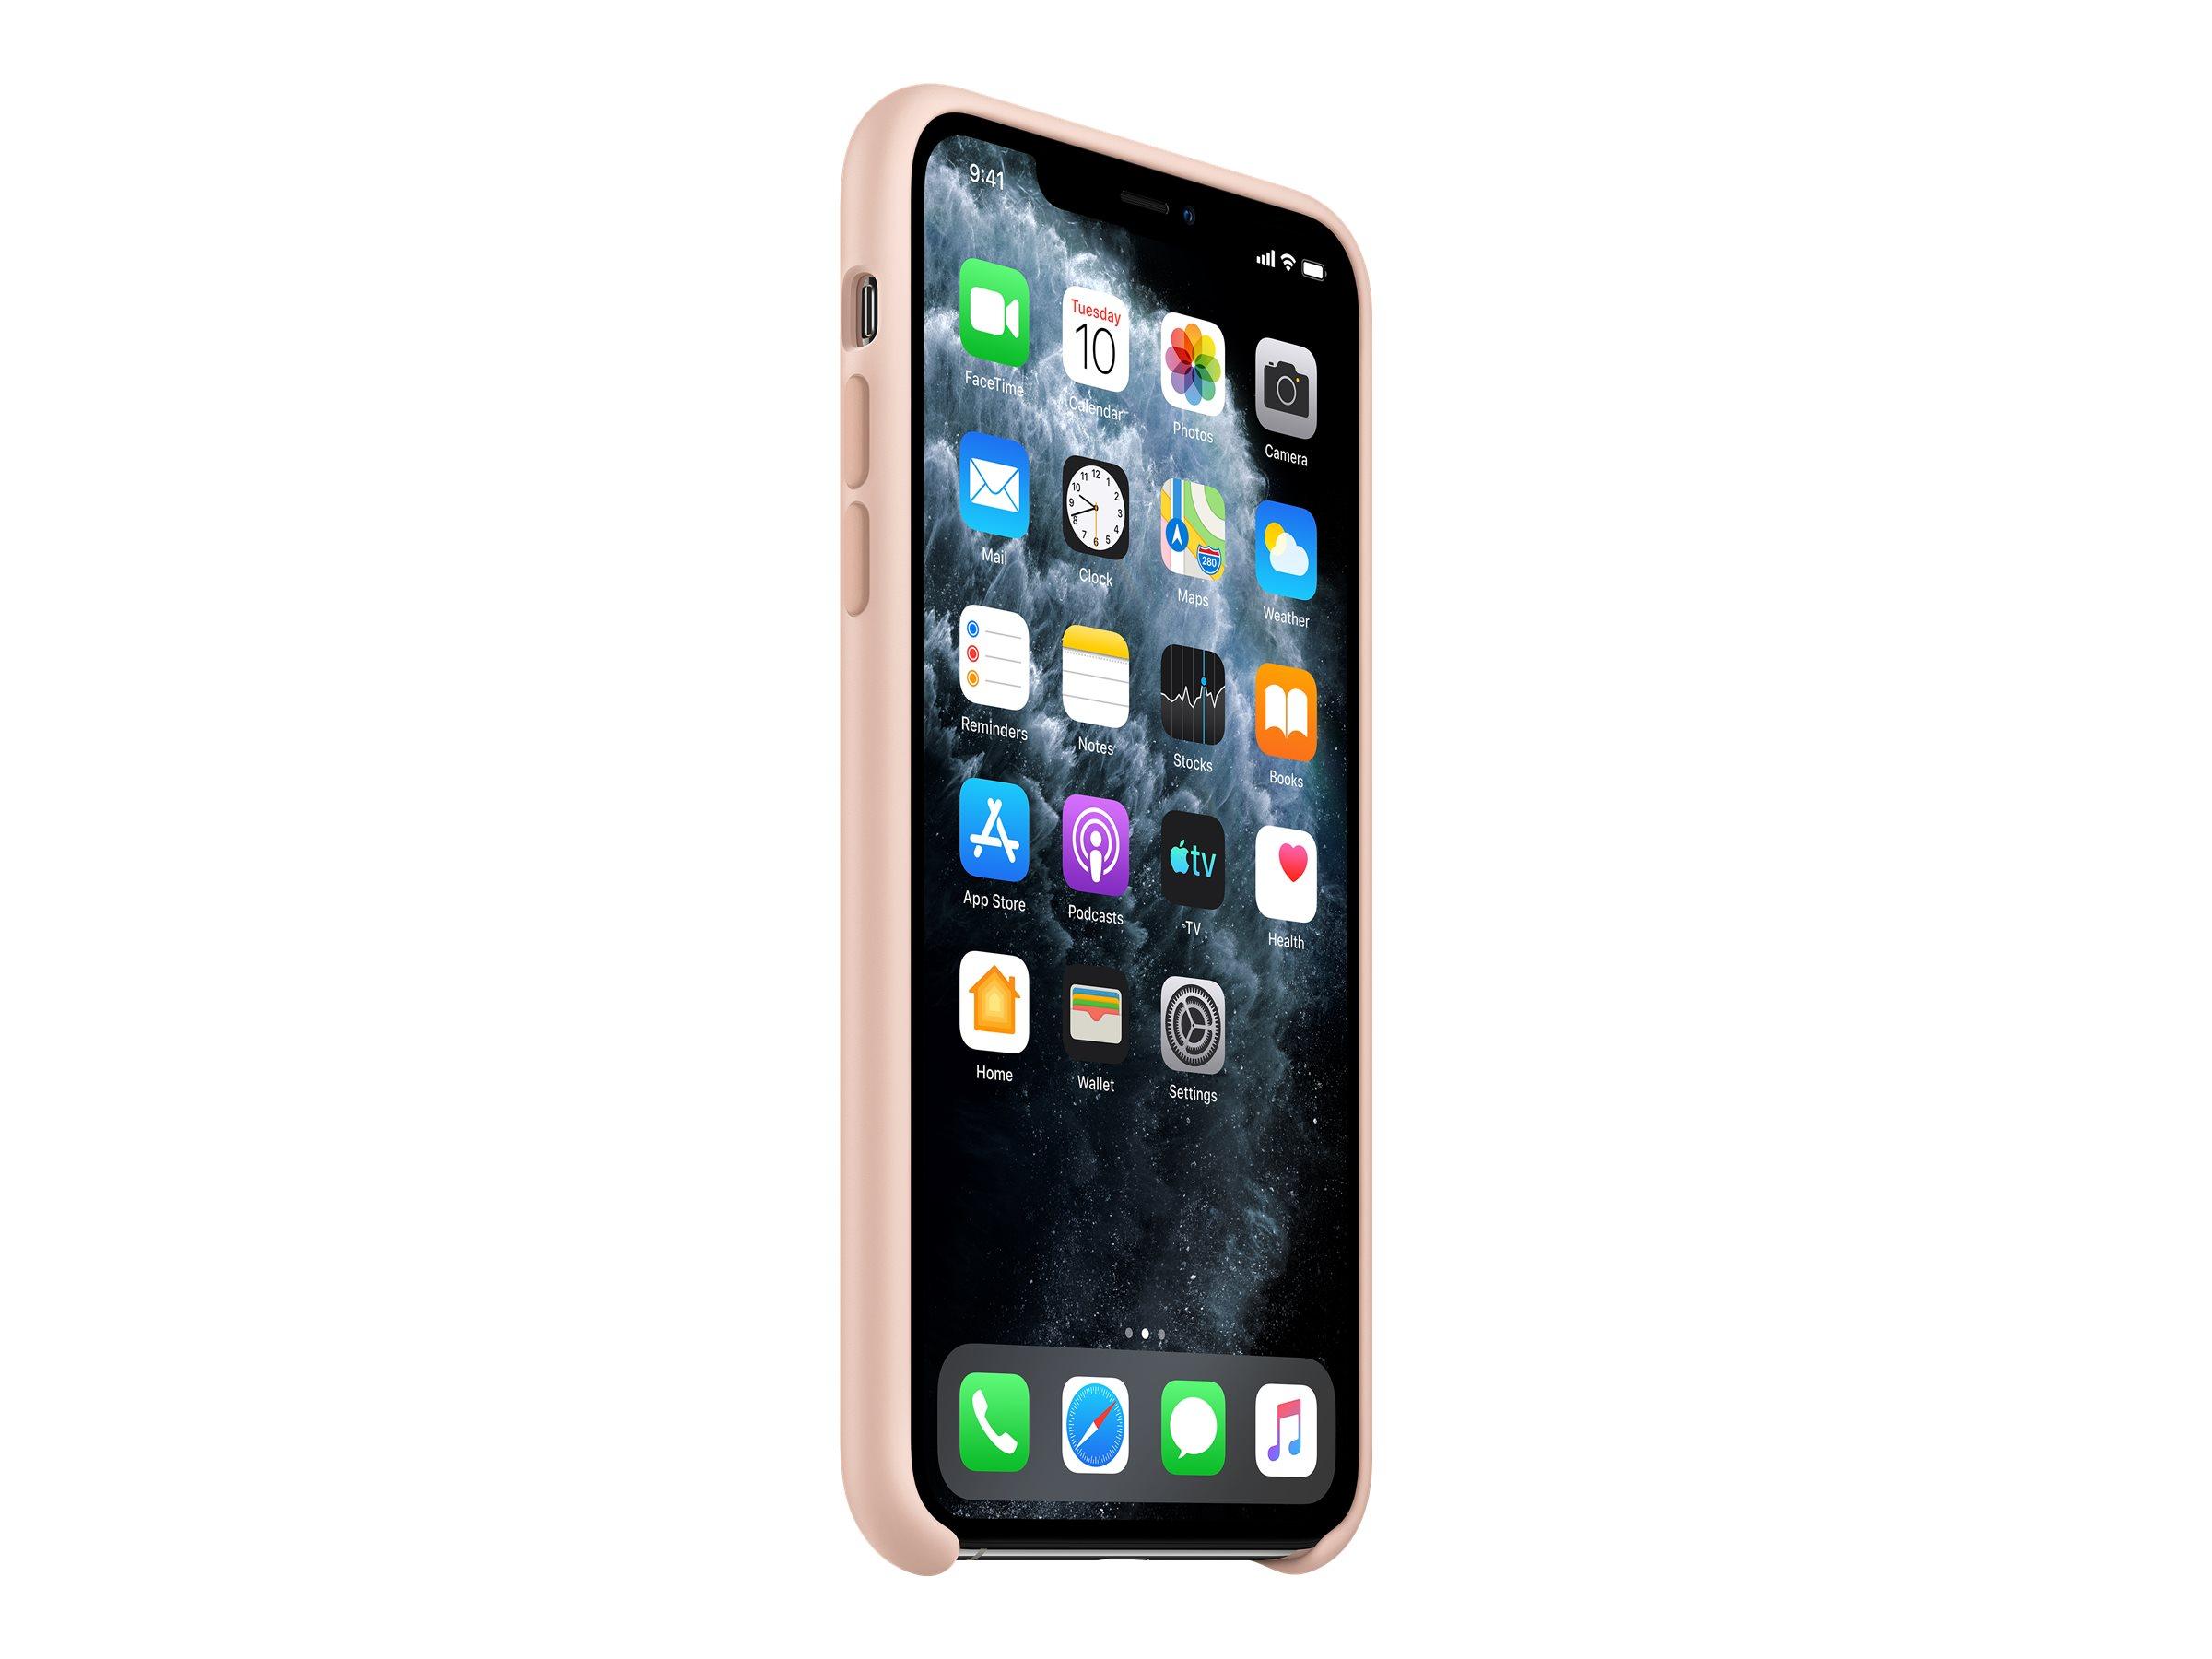 Hintere abdeckung fuer mobiltelefon silikon rosa sandfarben fuer iphone 11 pro max 11867128 mwyy2zm a